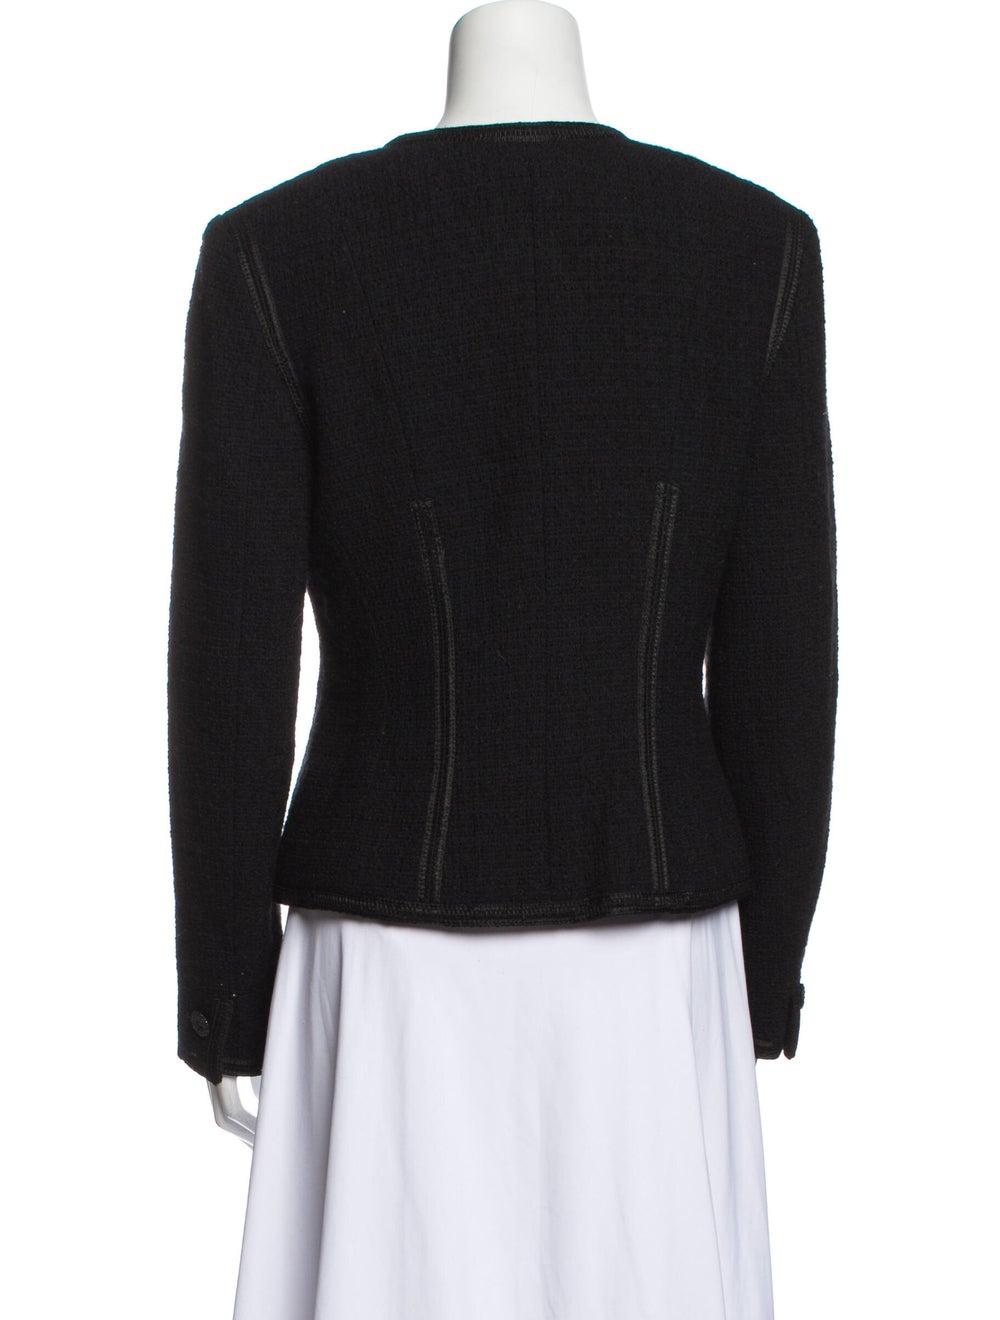 Chanel Vintage 2002 Evening Jacket Wool - image 3